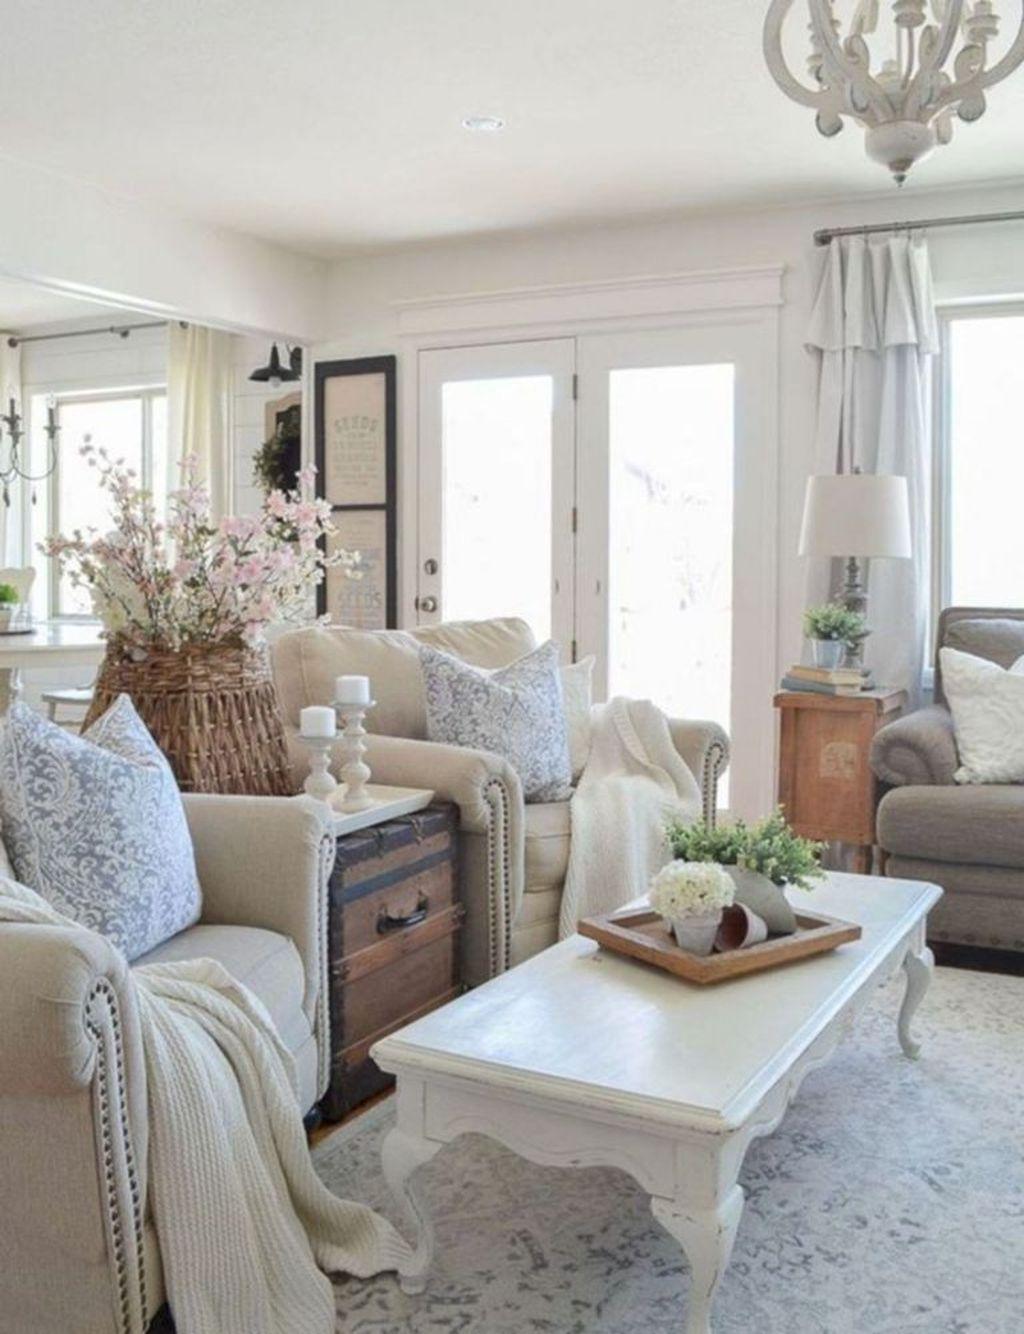 Rustic Farmhouse Furniture Design Ideas For Living Room 22